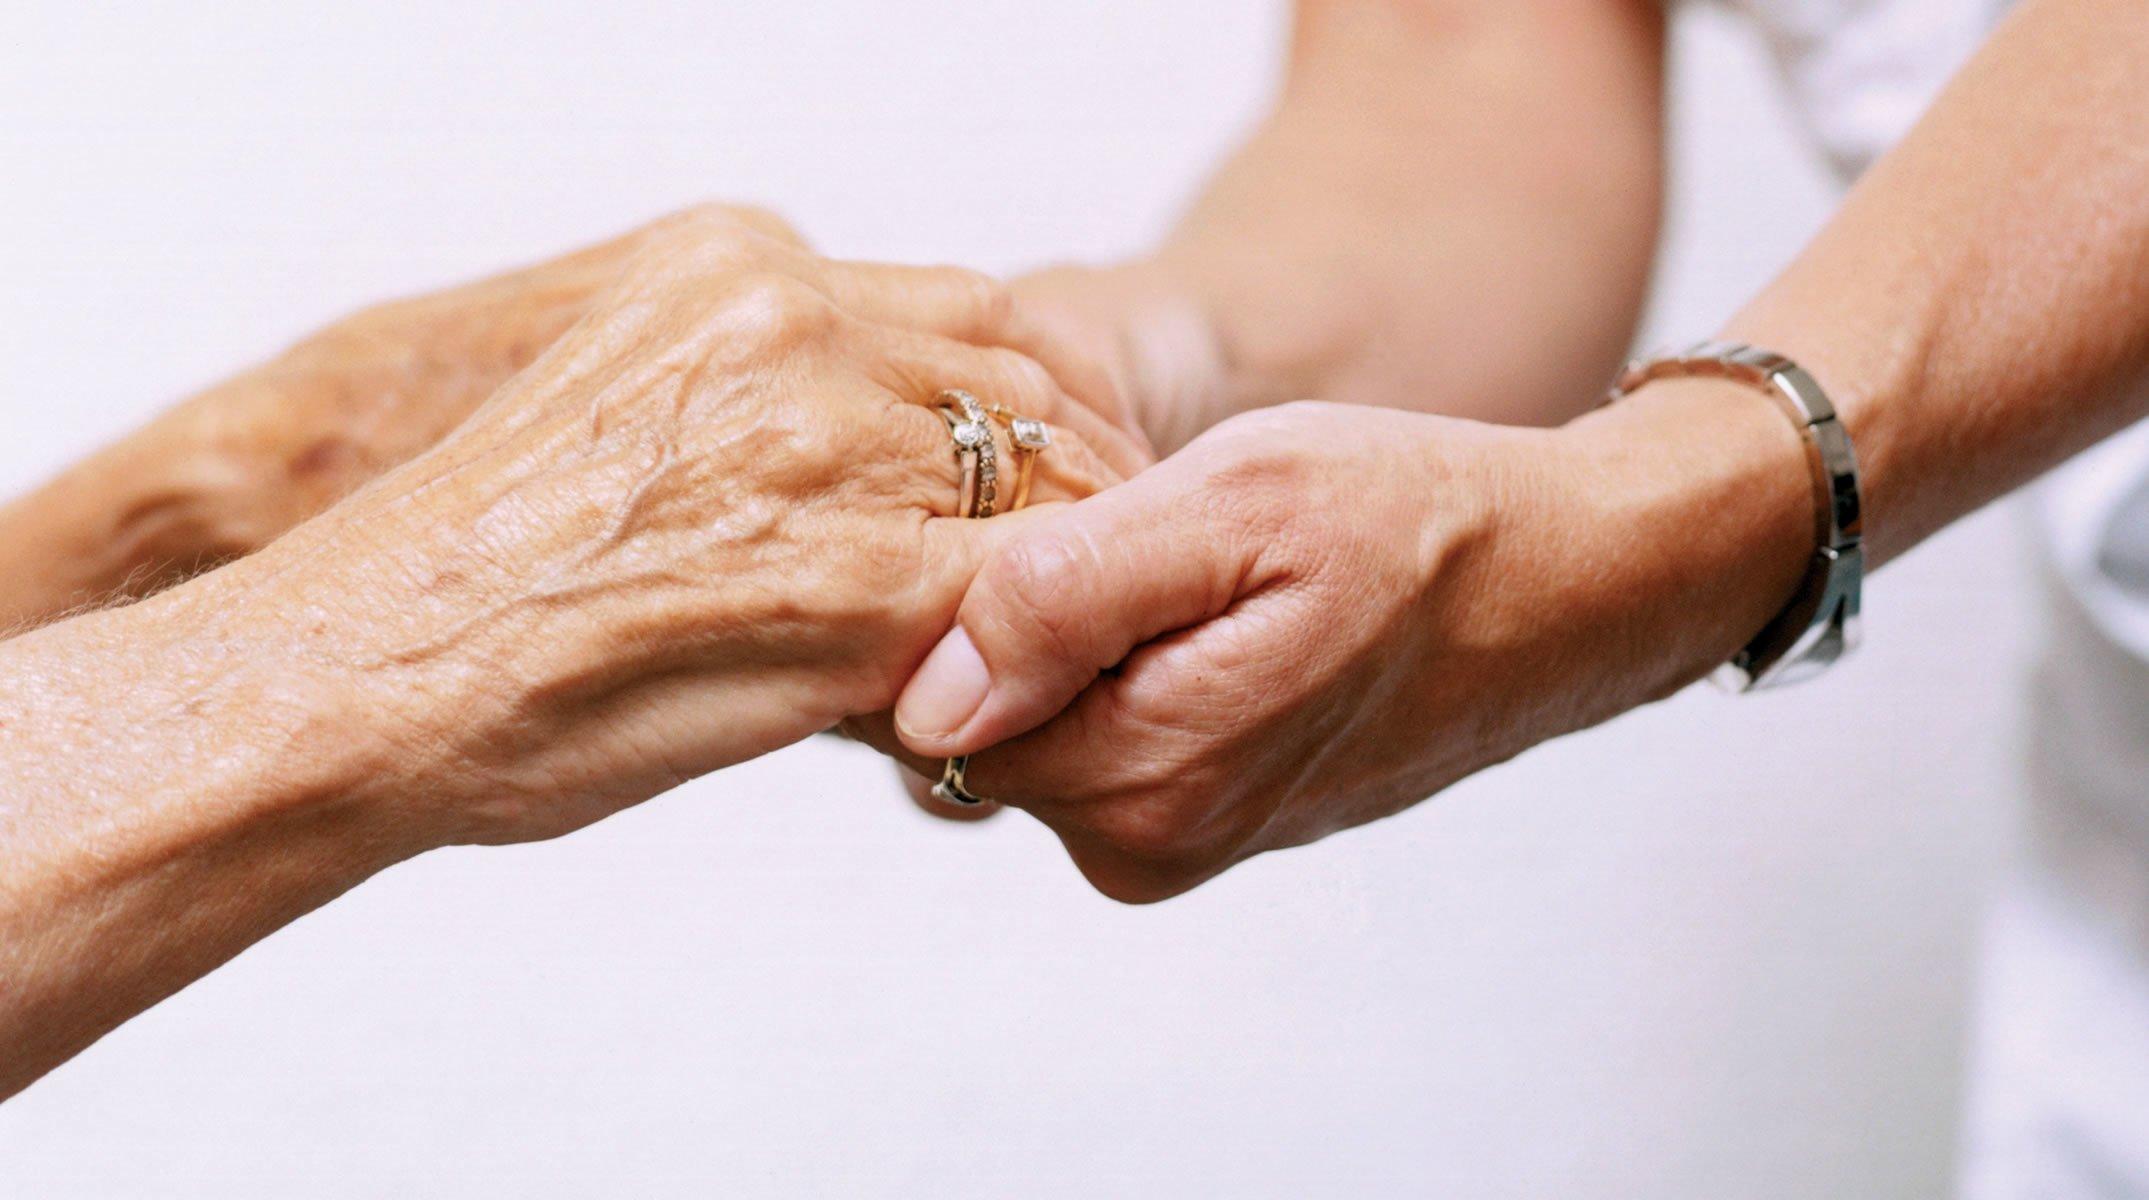 Trei sferturi dintre bolnavii cu Alzheimer din România rămân nediagnosticati